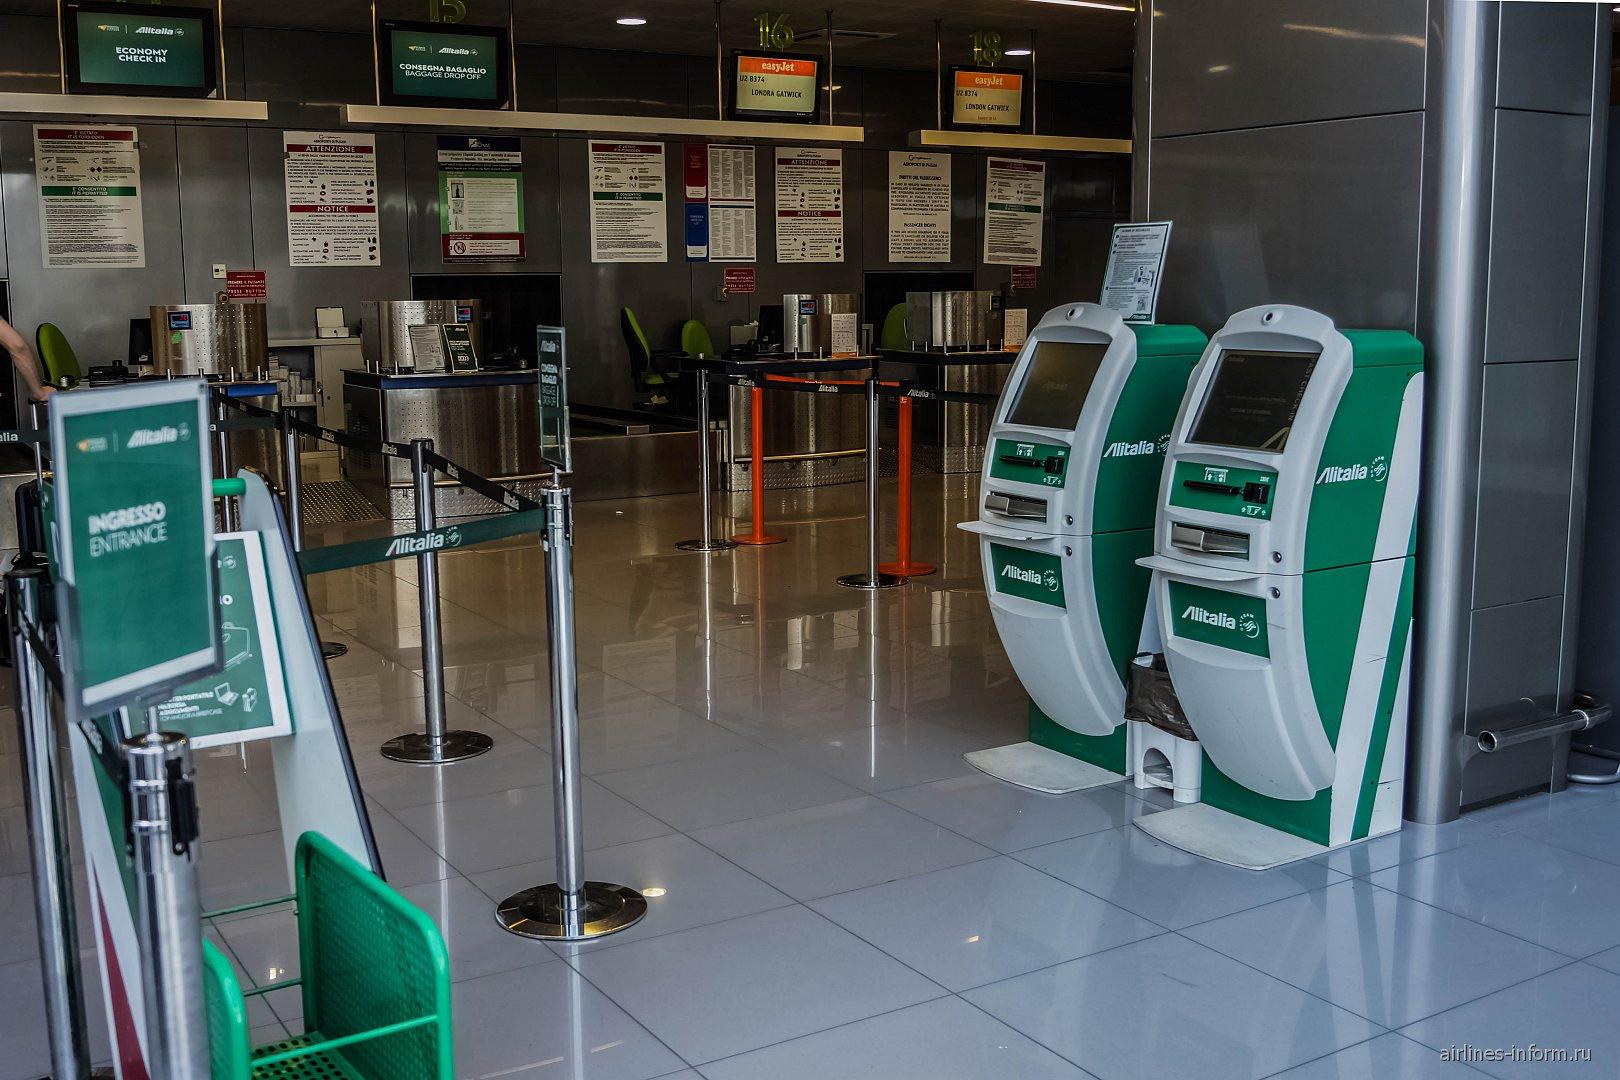 Зона регистрации в аэропорту Бриндизи Саленто